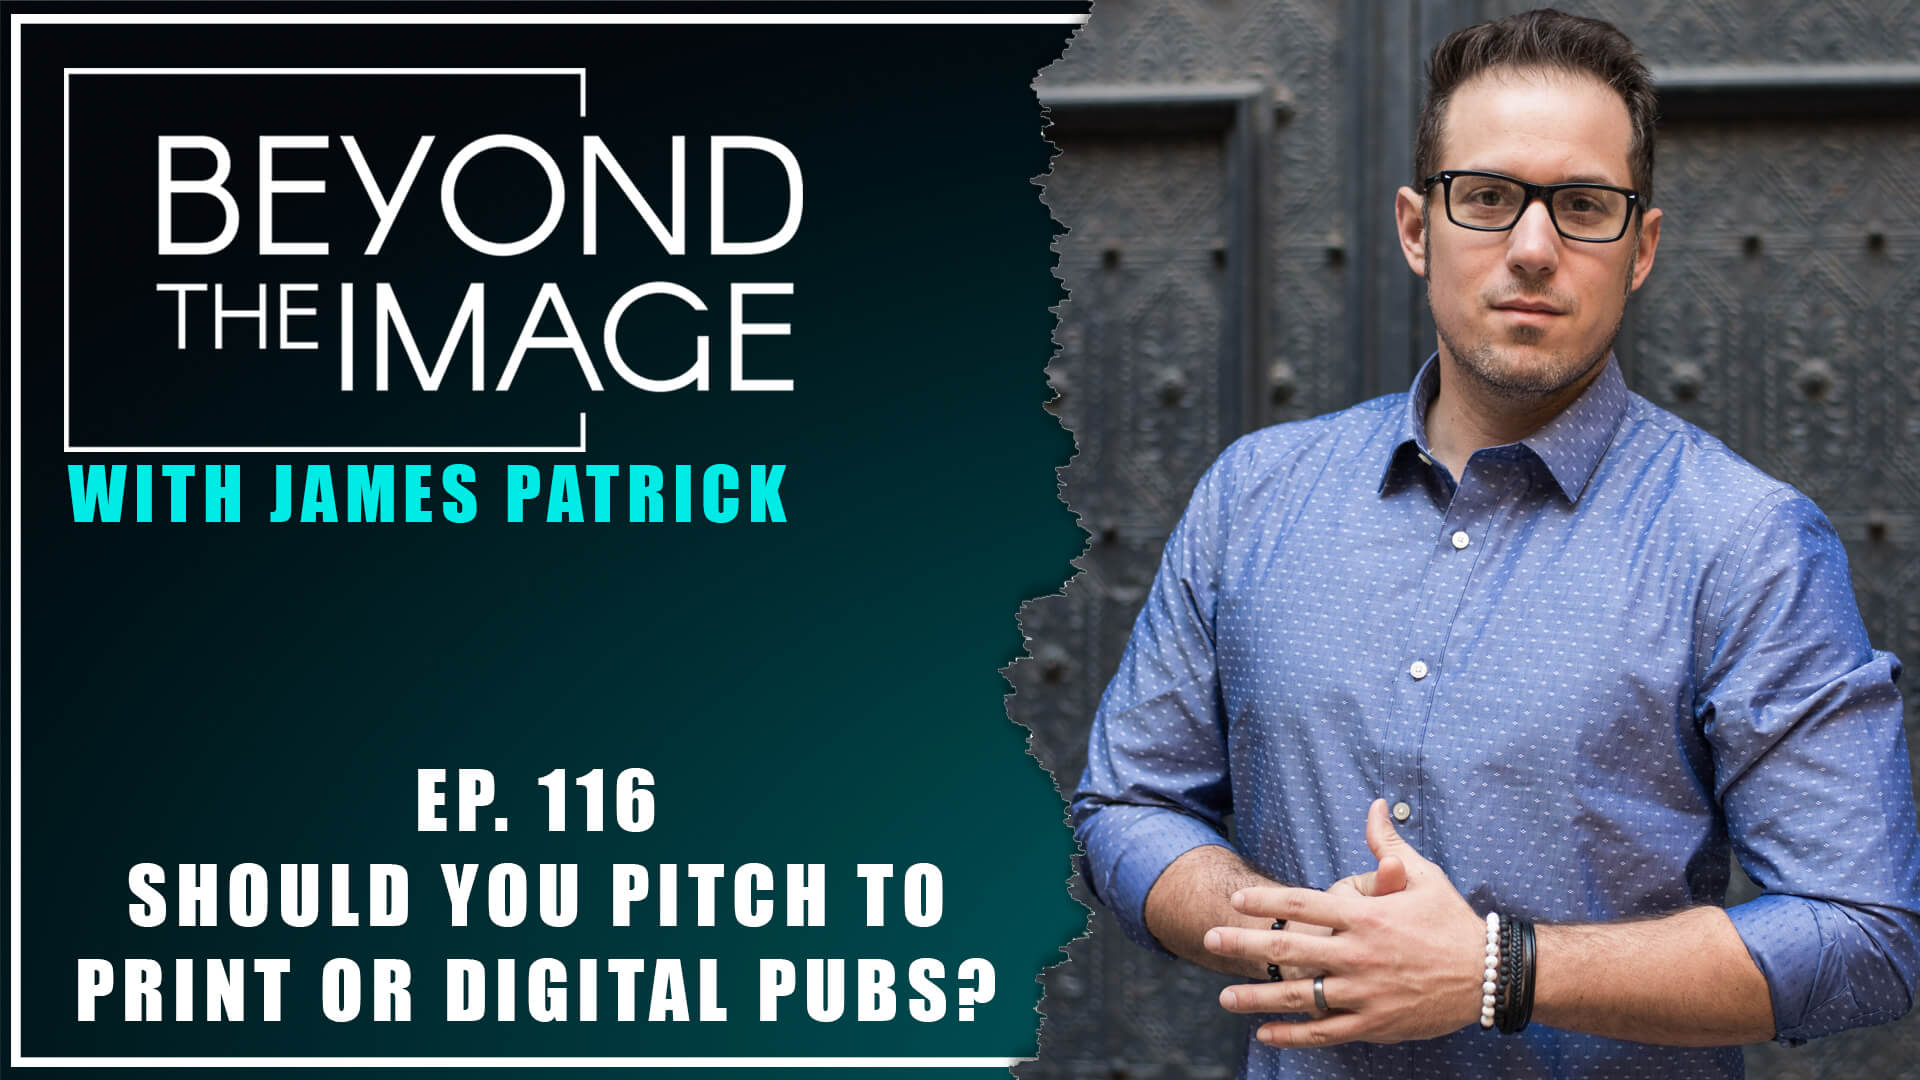 BTI #116: Should I Pitch to Print or Digital Publications?